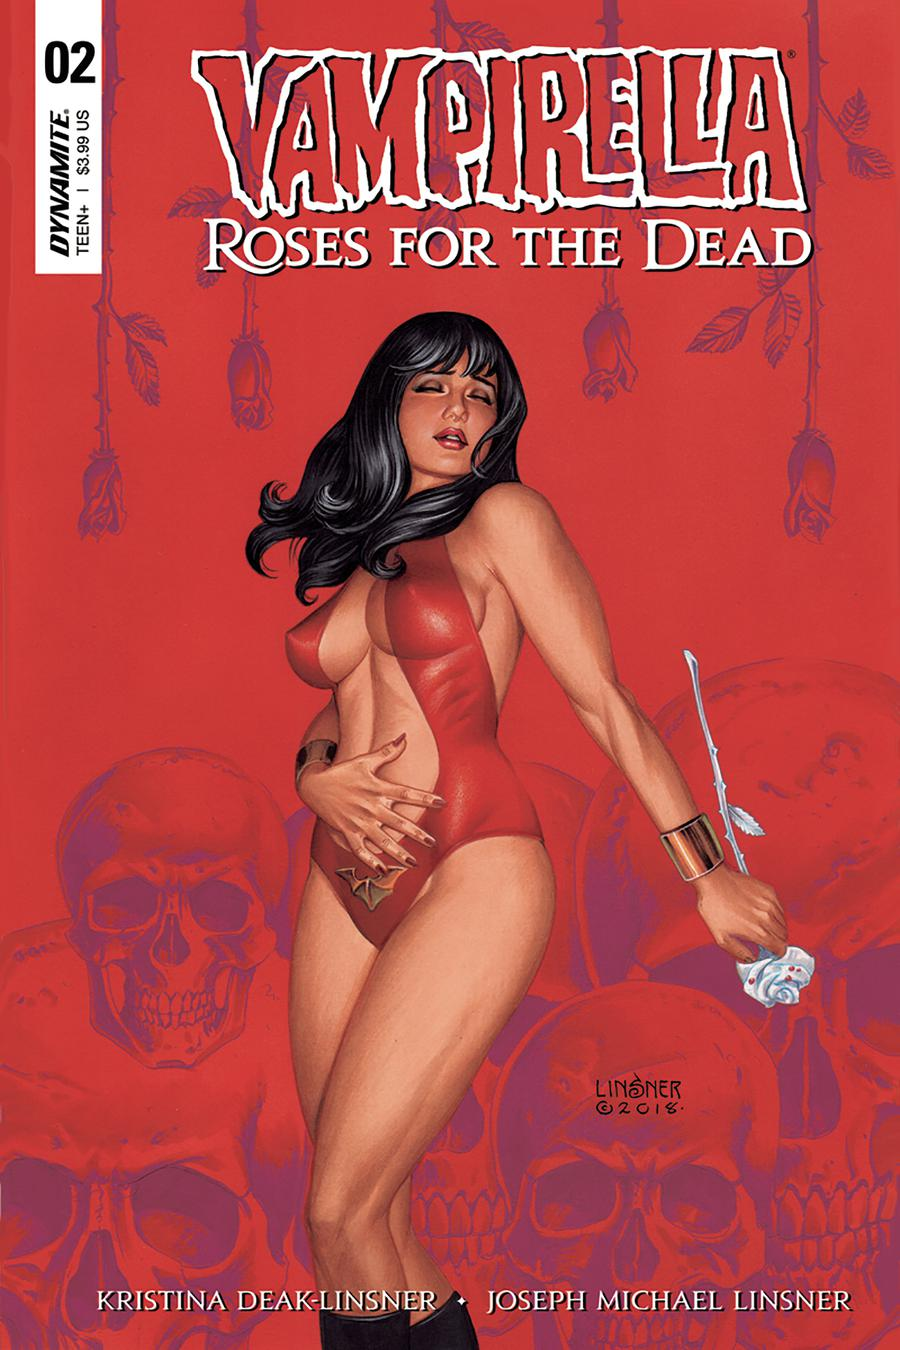 Vampirella Roses For The Dead #2 Cover A Regular Joseph Michael Linsner Cover